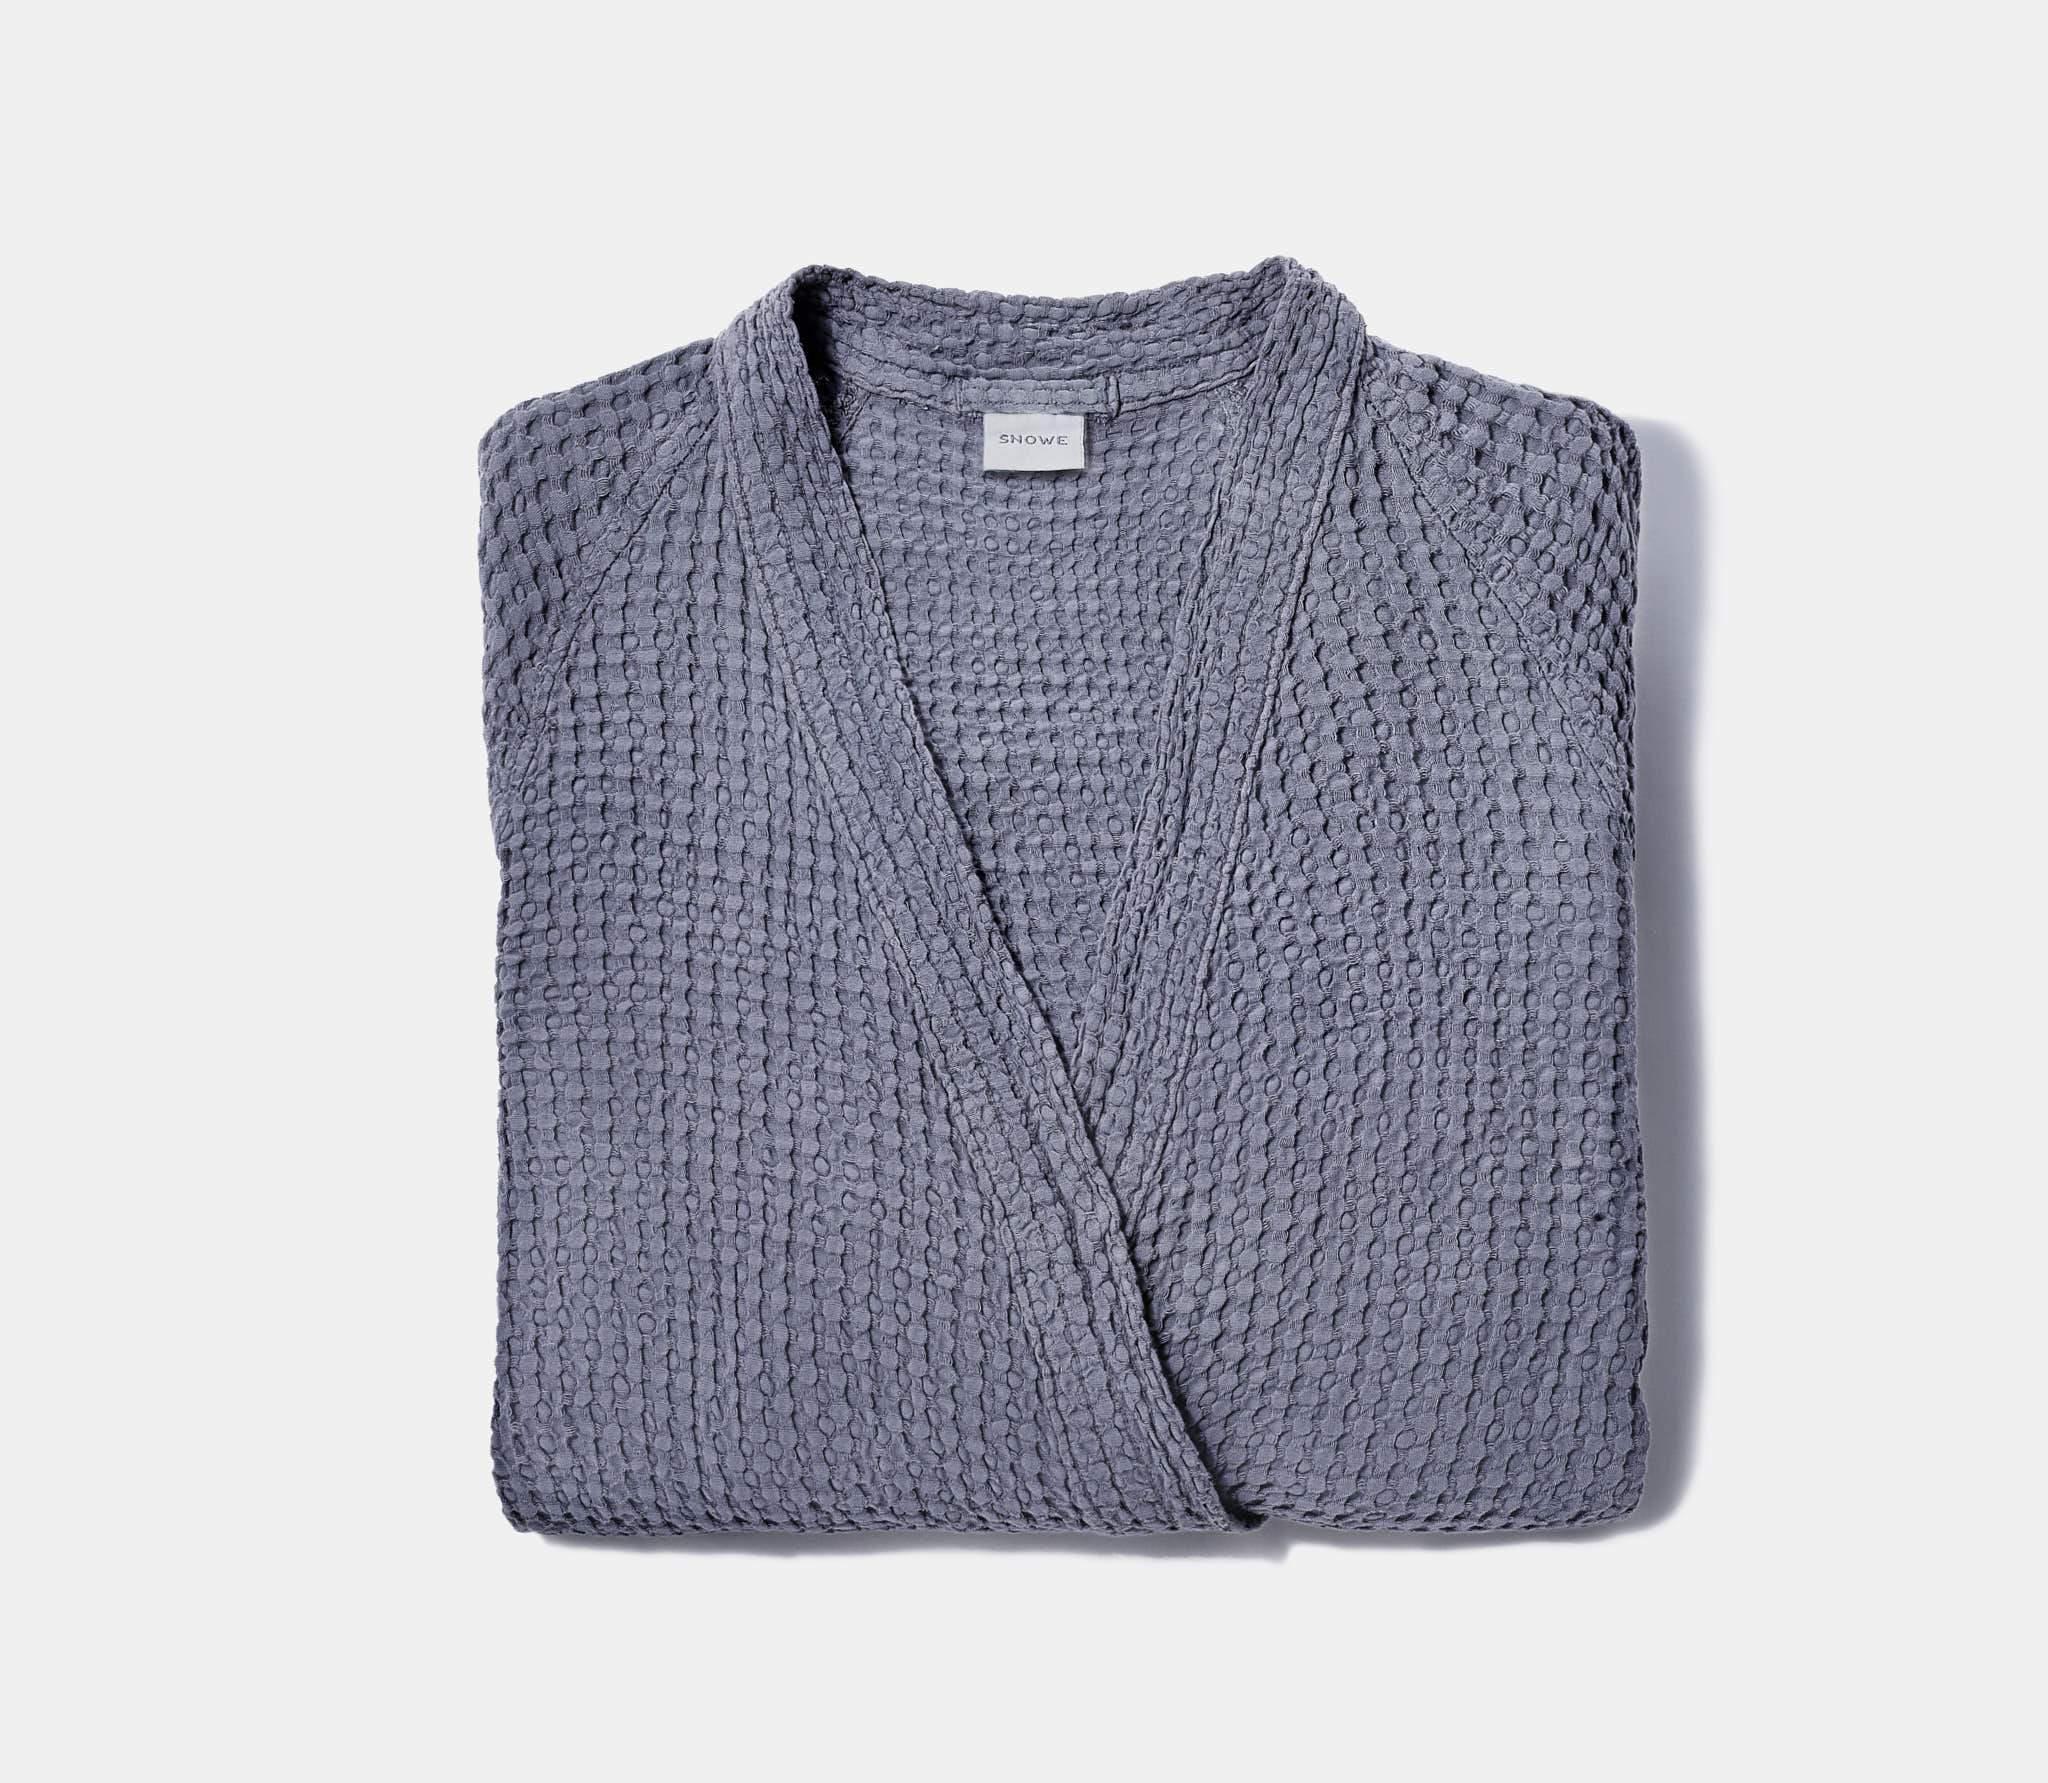 11.13_Snowe_NovemberHoliday93976-slate-honeycomb-bathrobe_PDP_2048x2048